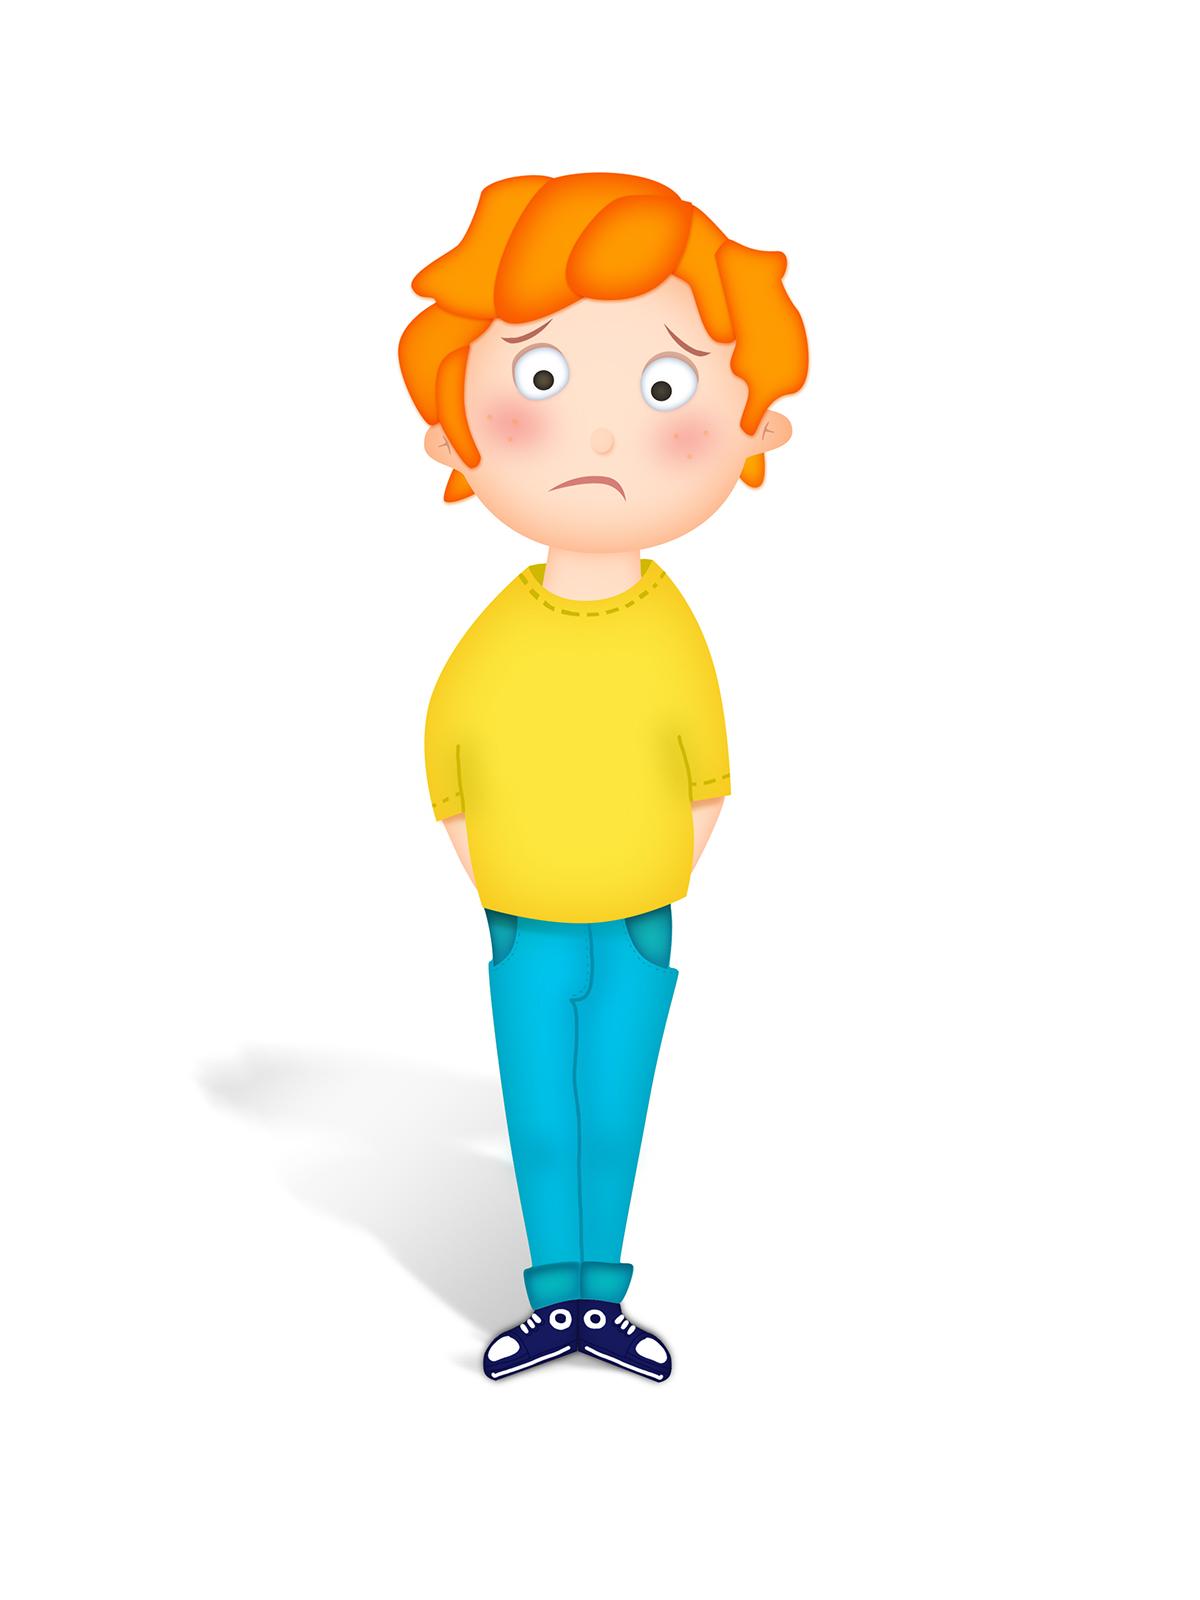 Sad Boy Illustration